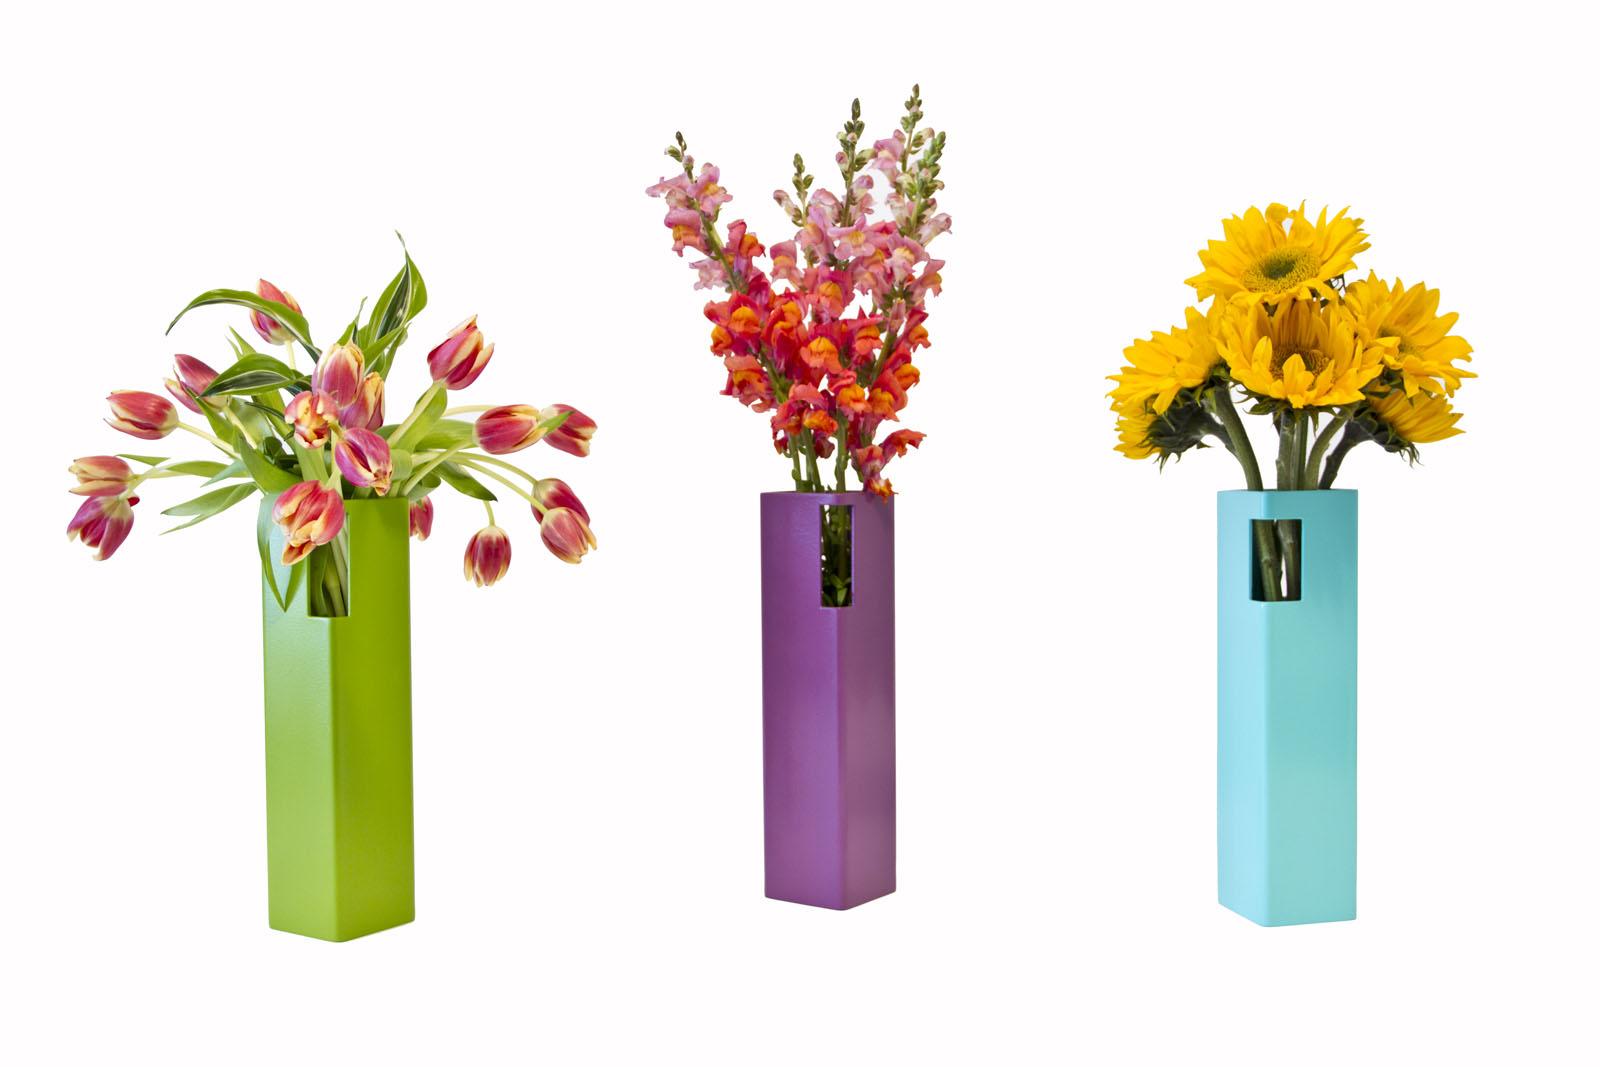 New Colorful Vases In Bright Spring Hues Custom Metal